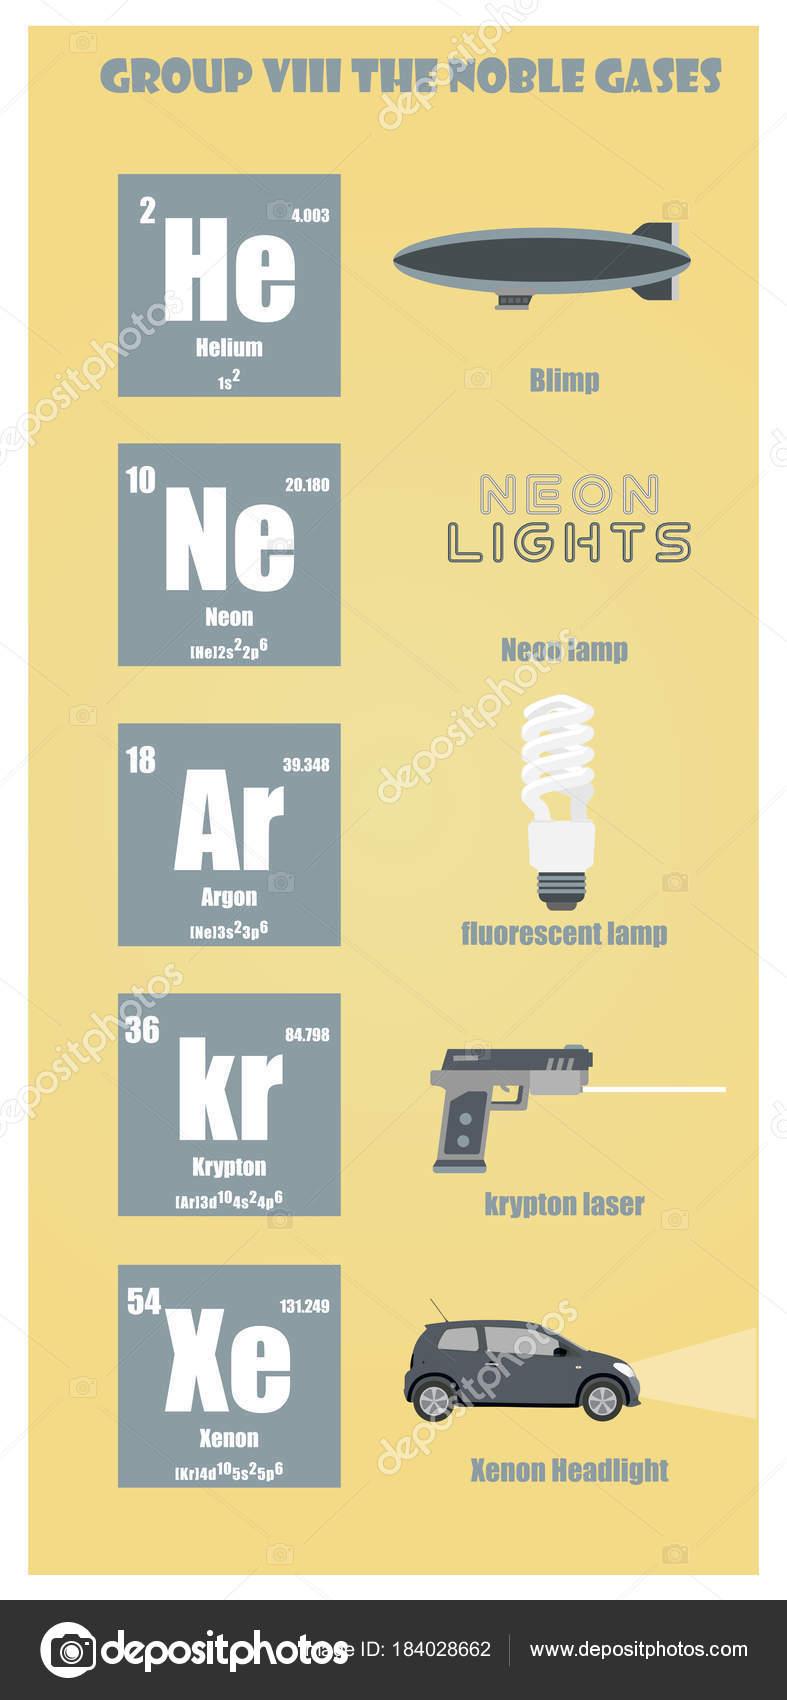 Tabla periodica los elemento del grupo viii los gases nobles tabla periodica los elemento del grupo viii los gases nobles vector de stock urtaz Images